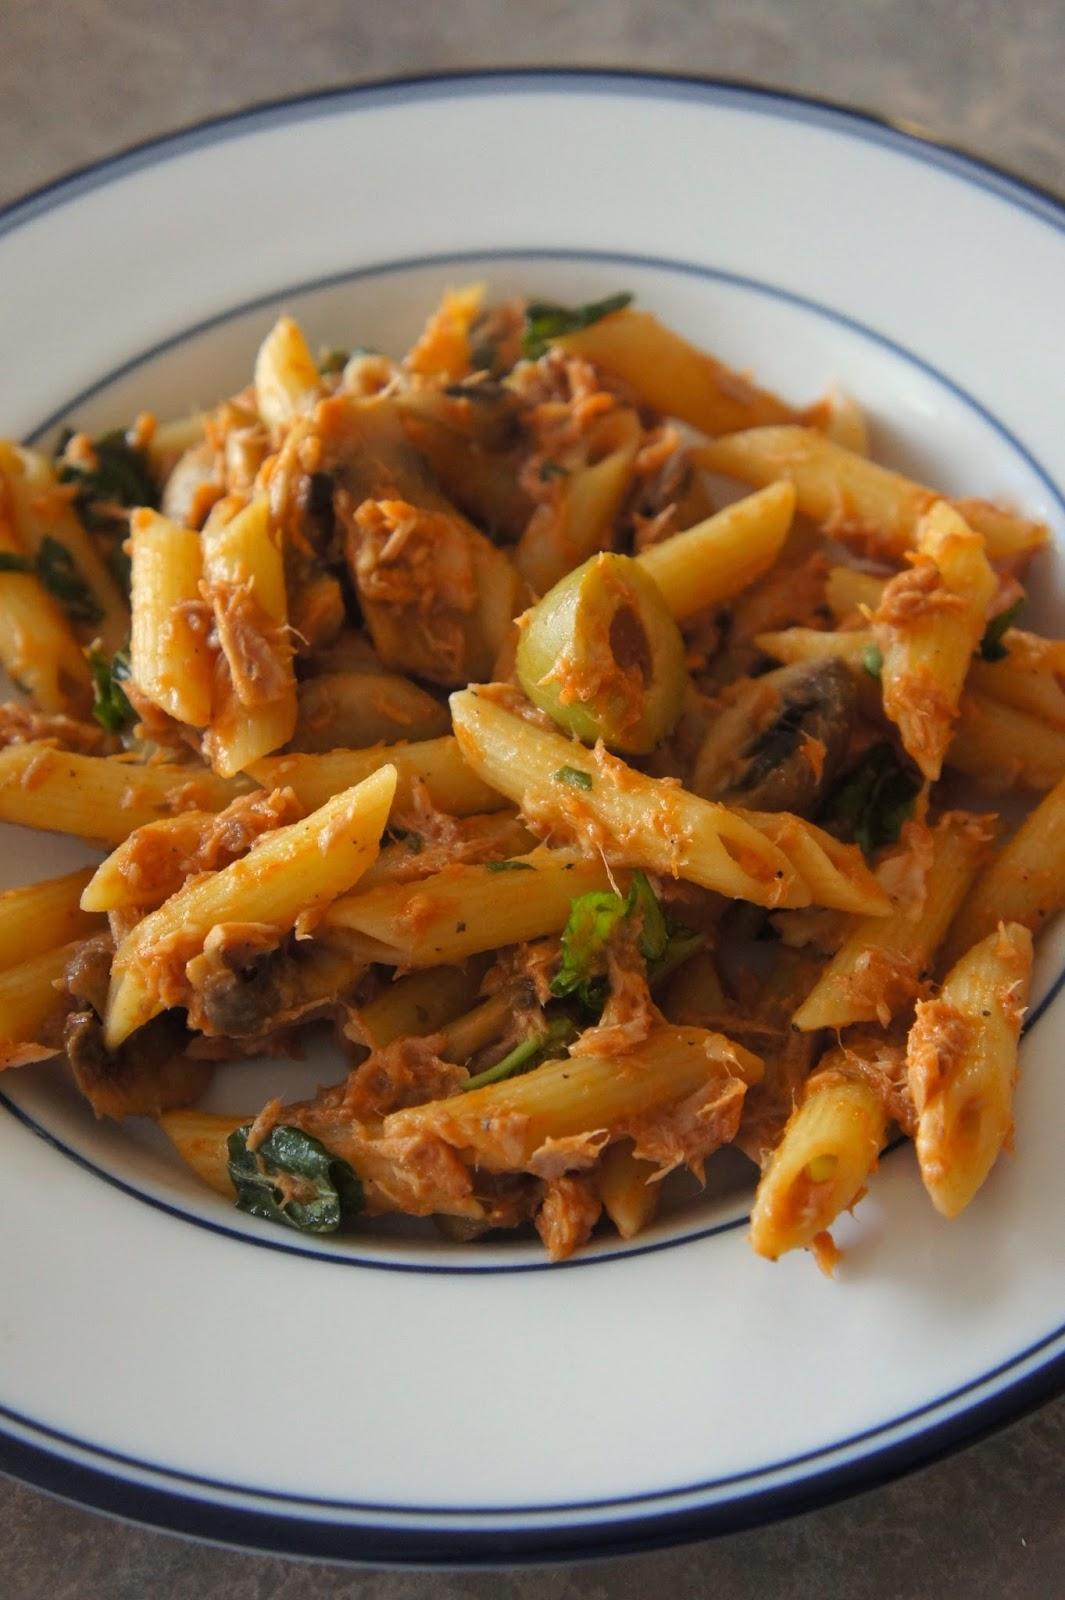 Pirate Pasta: Savory Sweet and Satsifying